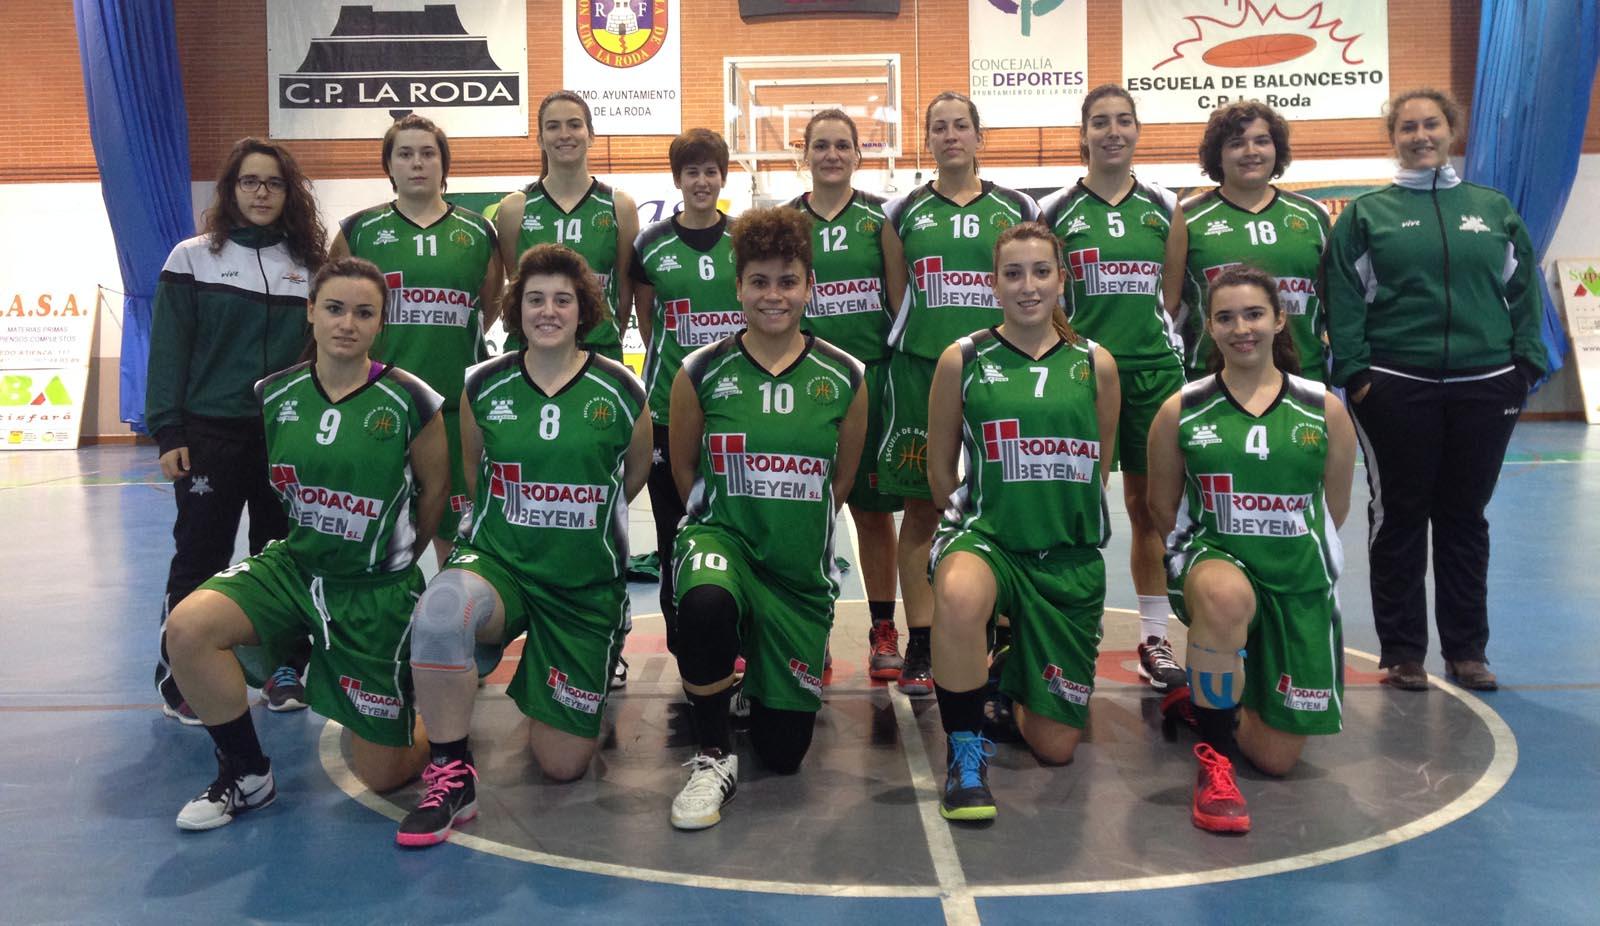 Rodacal Beyem CP La Roda